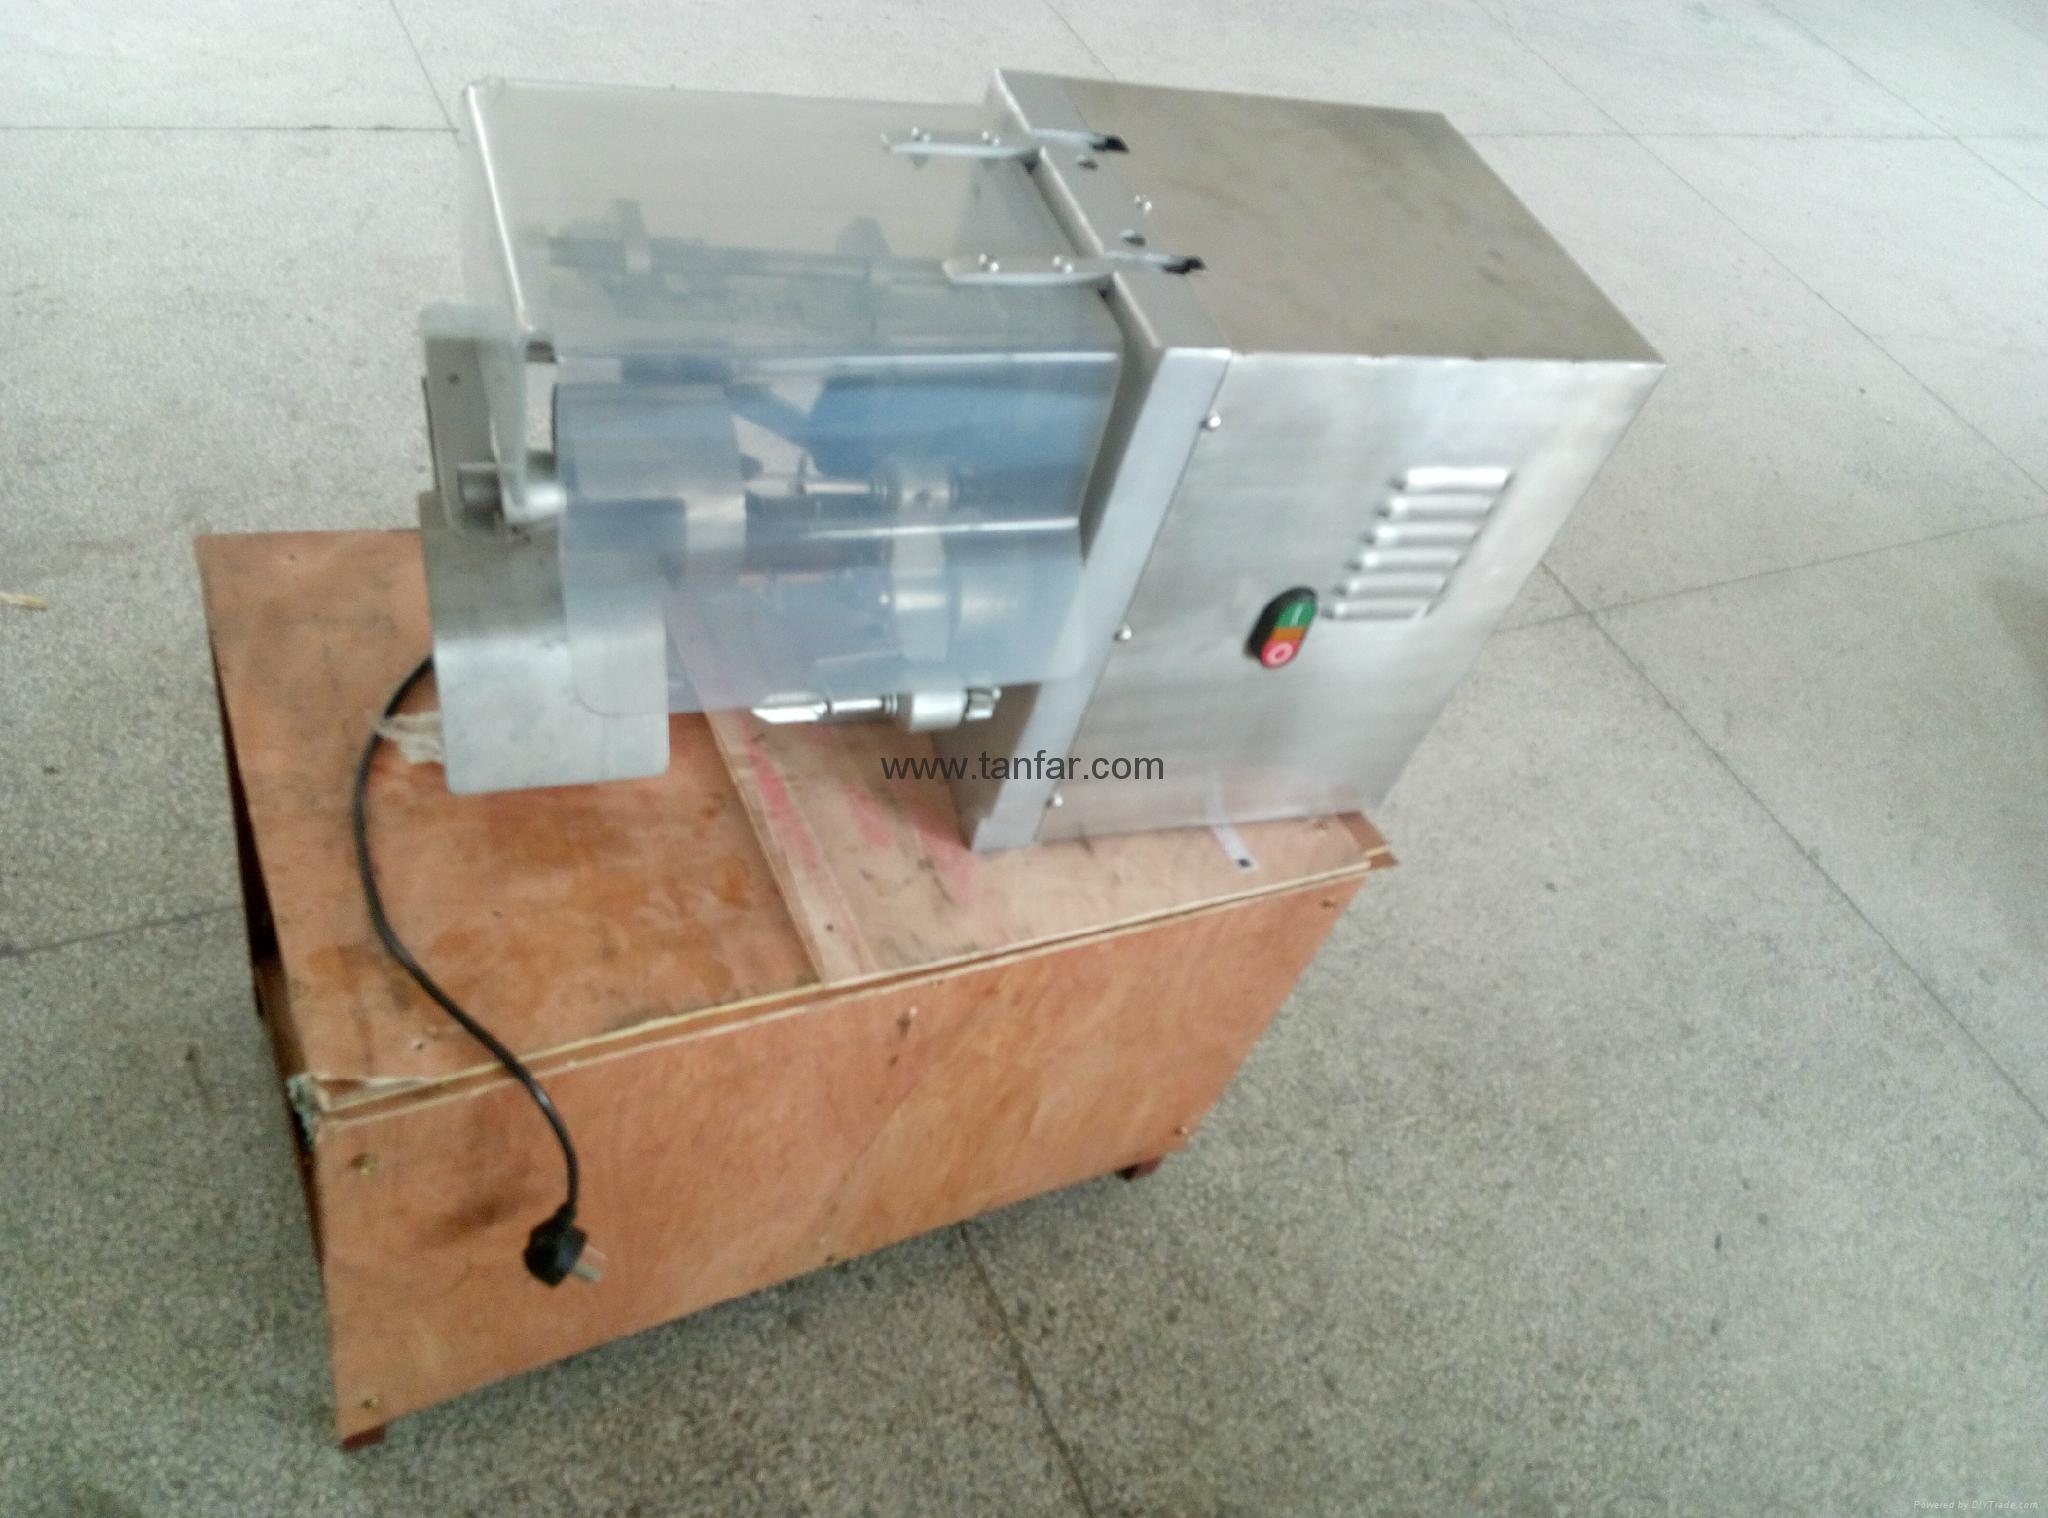 Suzumo SVC-ATC (Automatic Sushi Rolls Cutter) 16